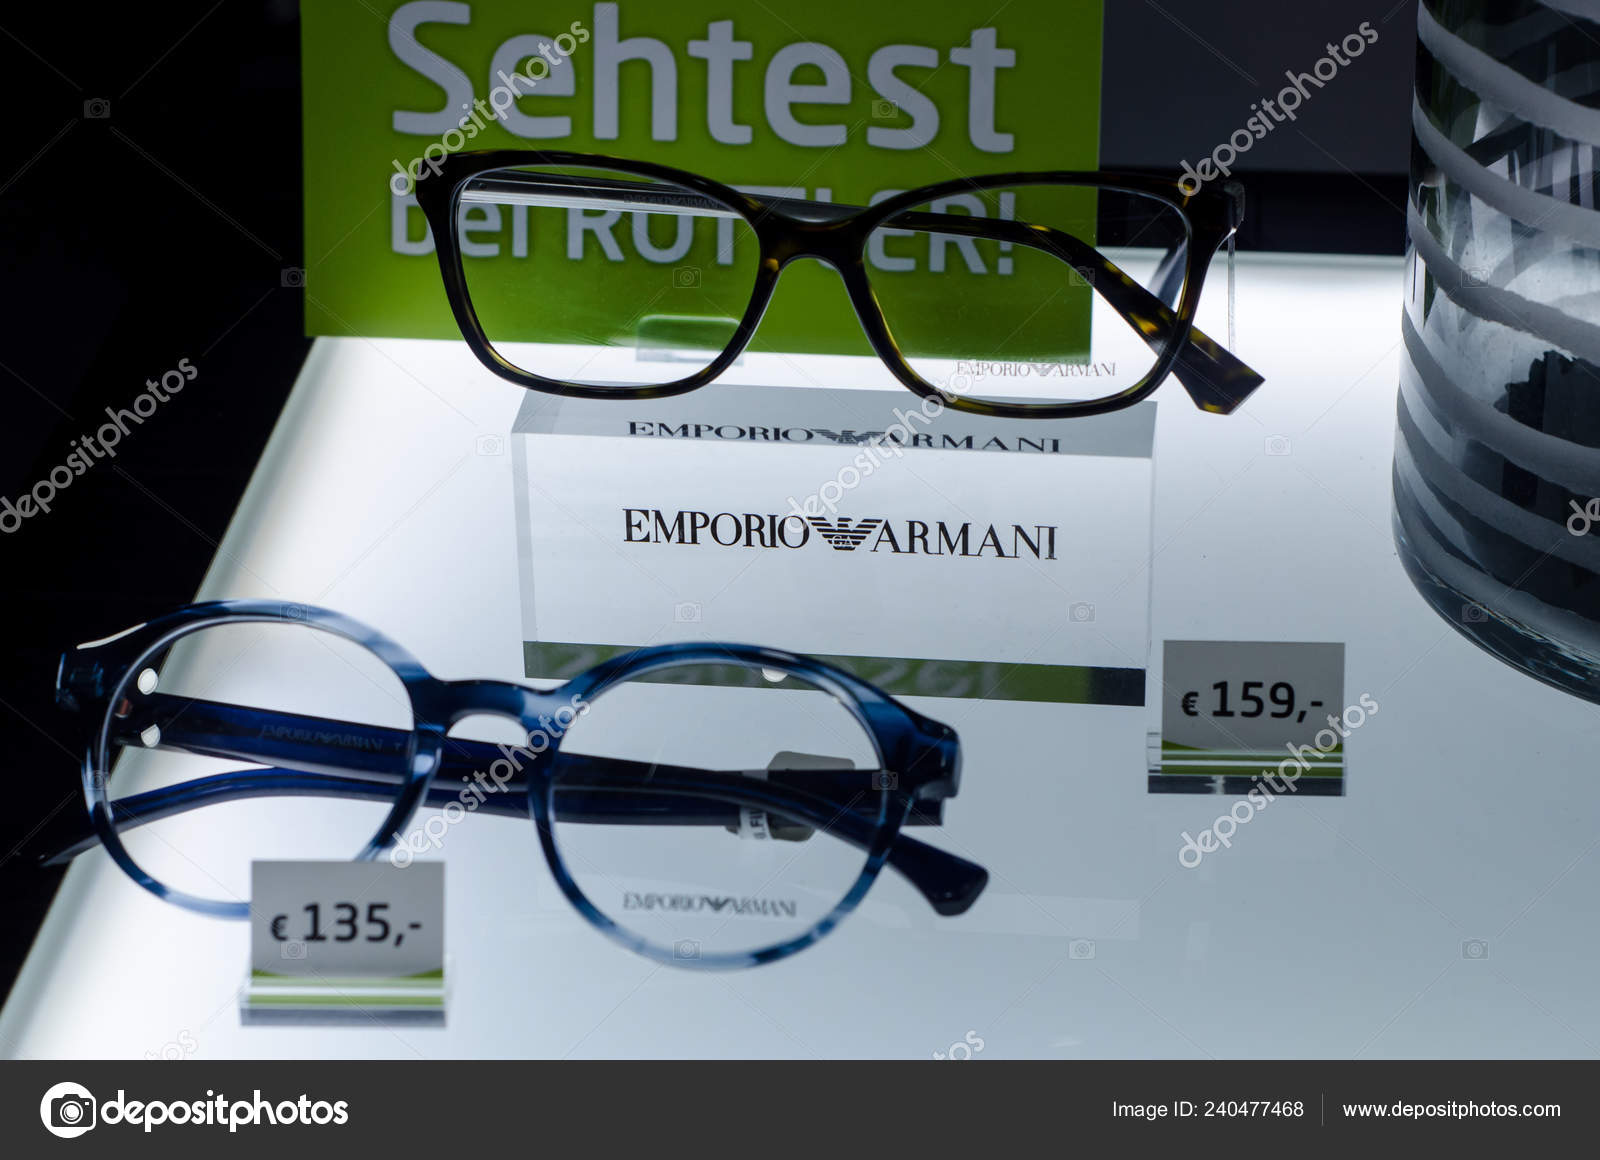 8700f90e805d Soest Germany January 2019 Emporio Armani Glasses Shop Window — Stock Photo